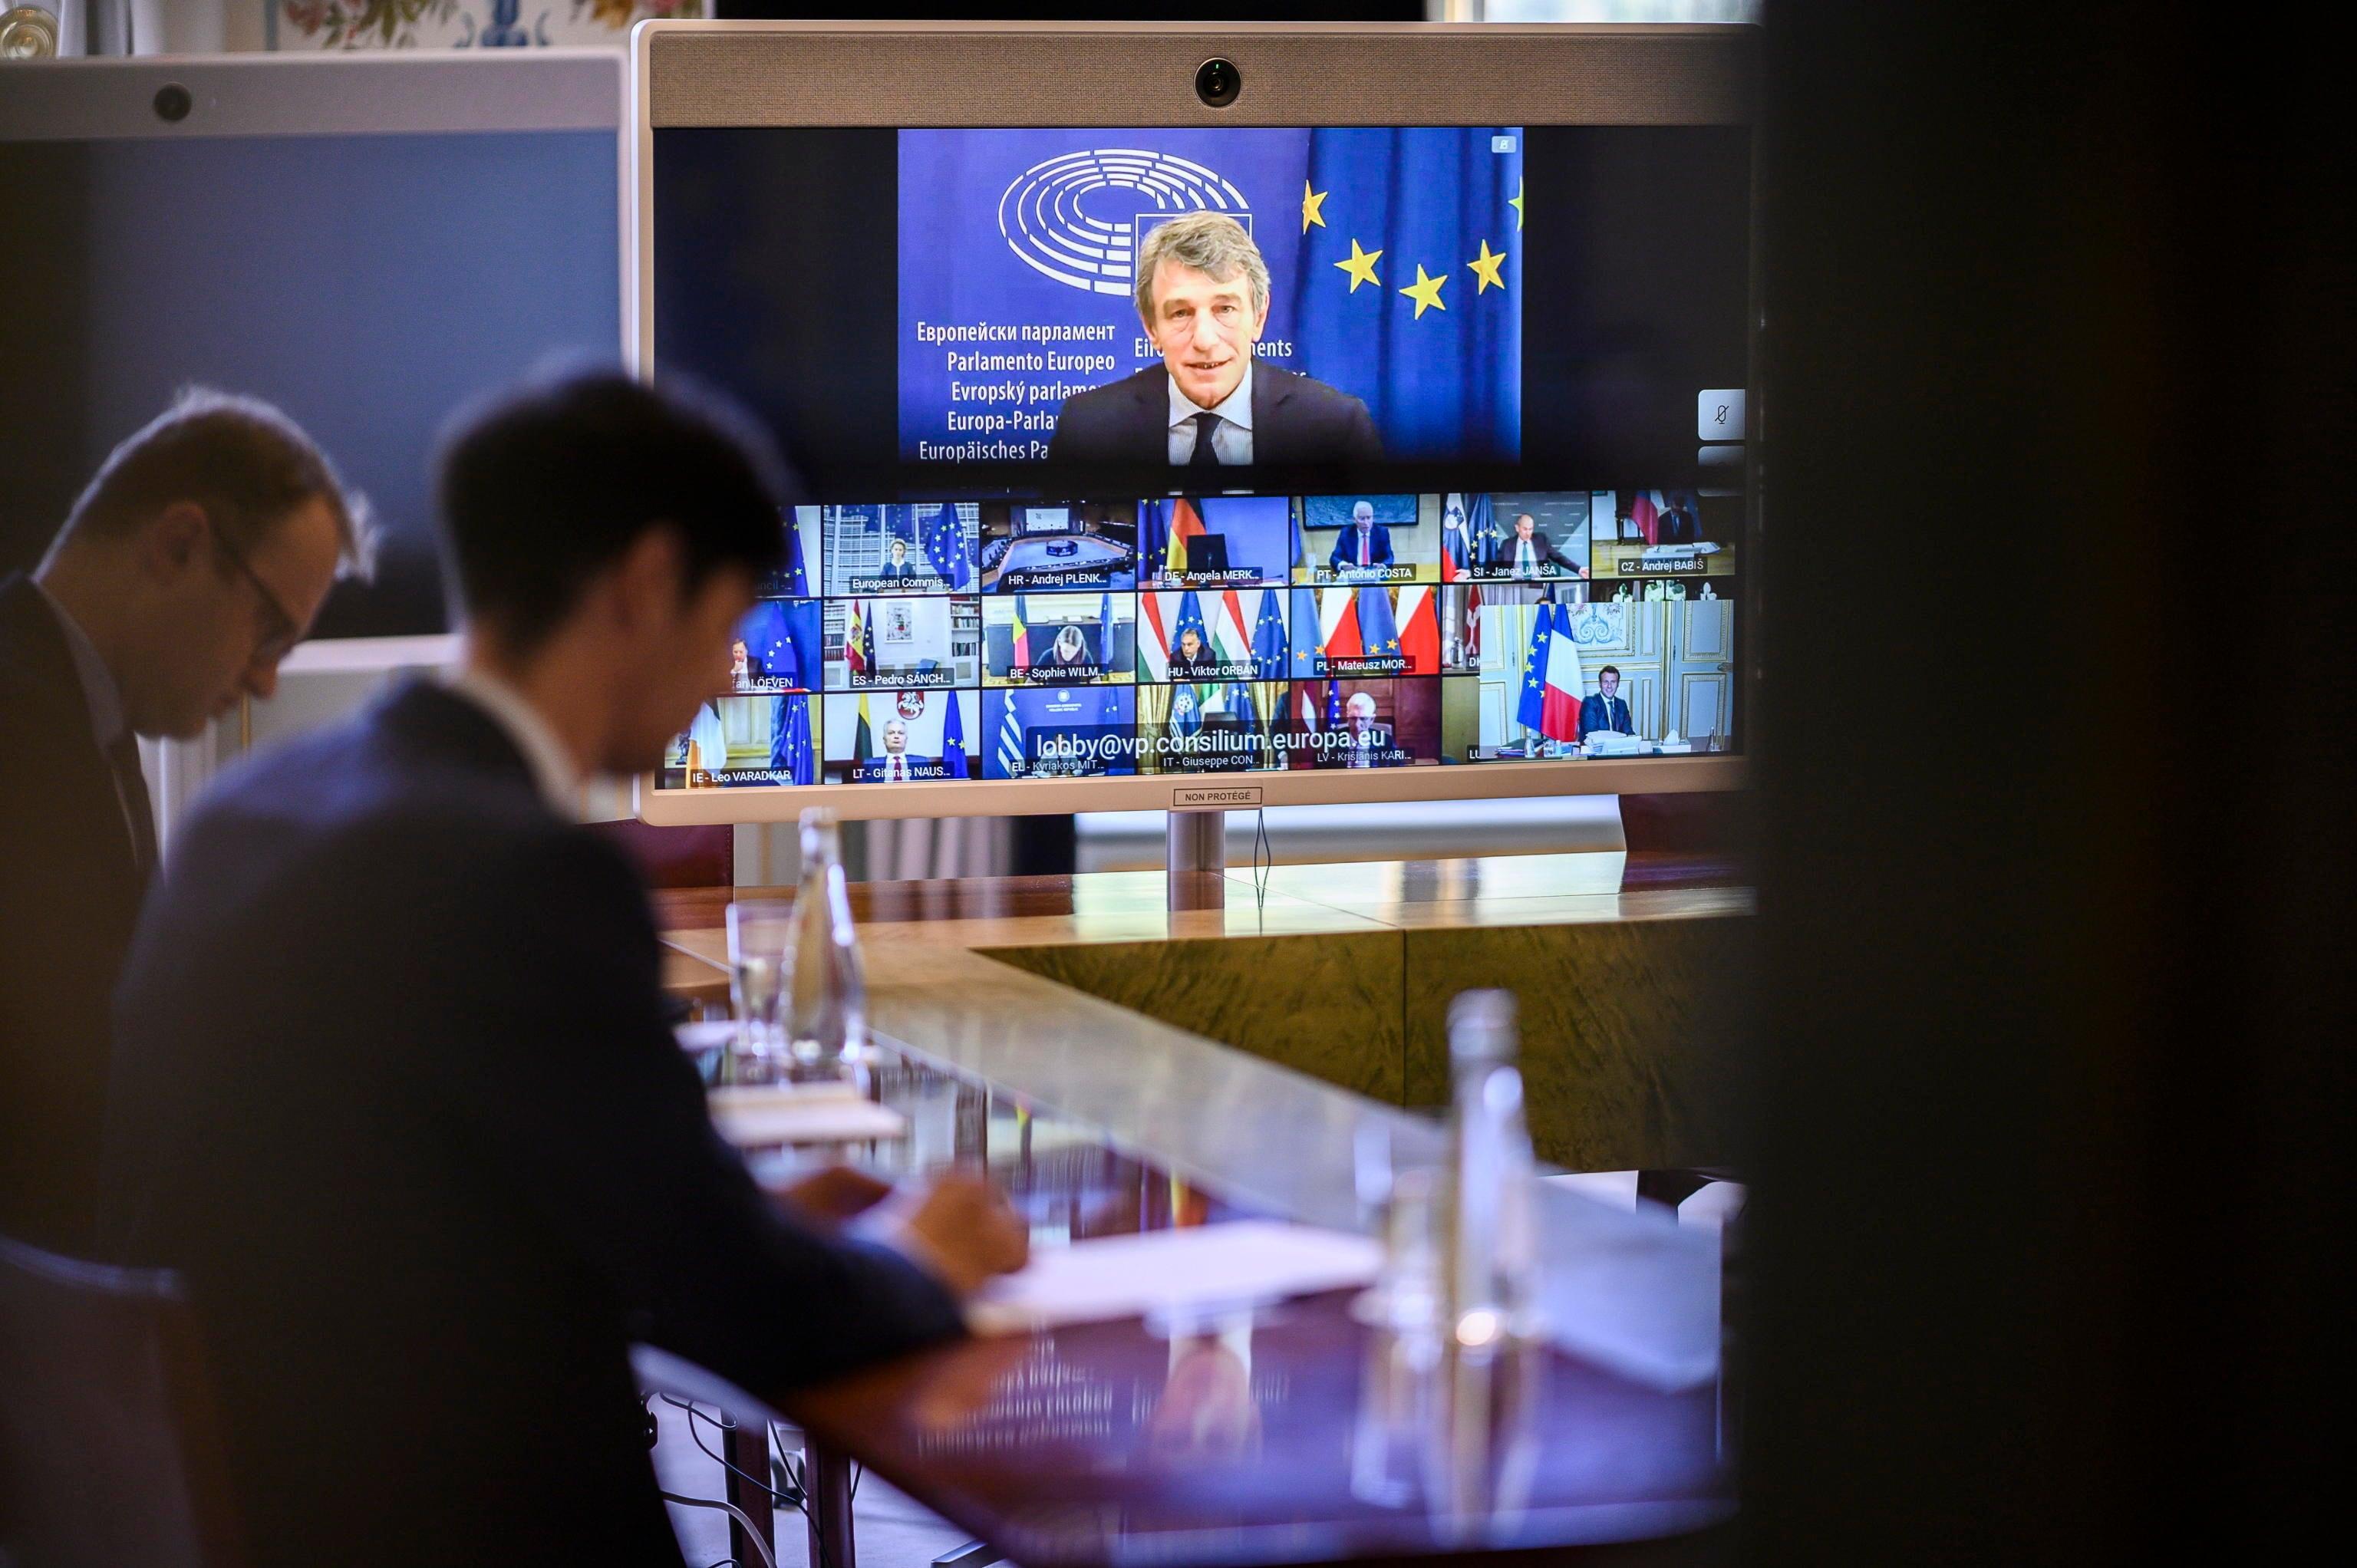 consiglio europeo recovery